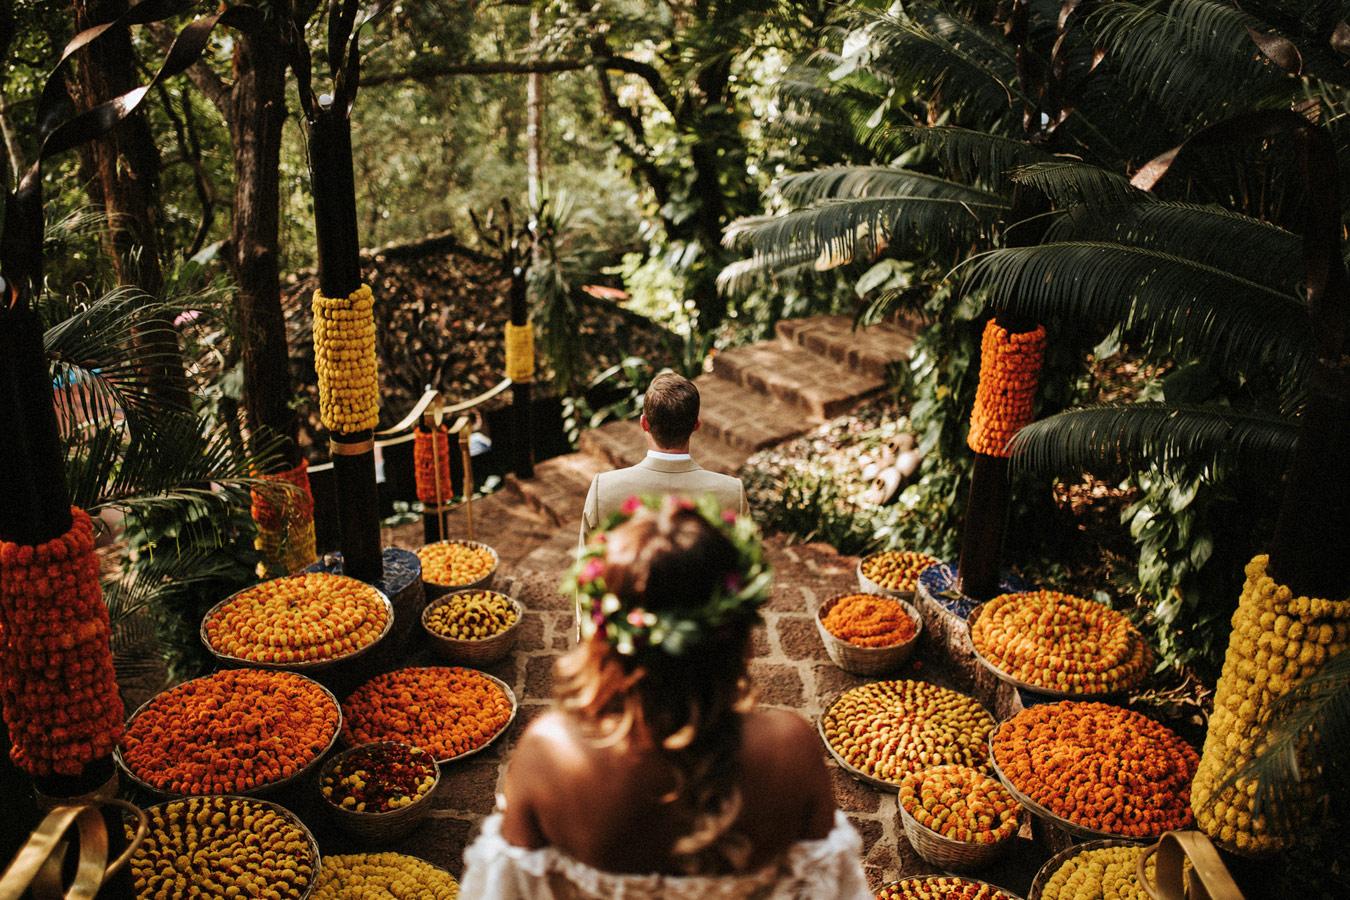 © Lukas Piatek, Bottrop, Nrw, Germany, 1st place in category Professional : Destination Weddings, Rangefinder Wedding Contest 2017 Winners